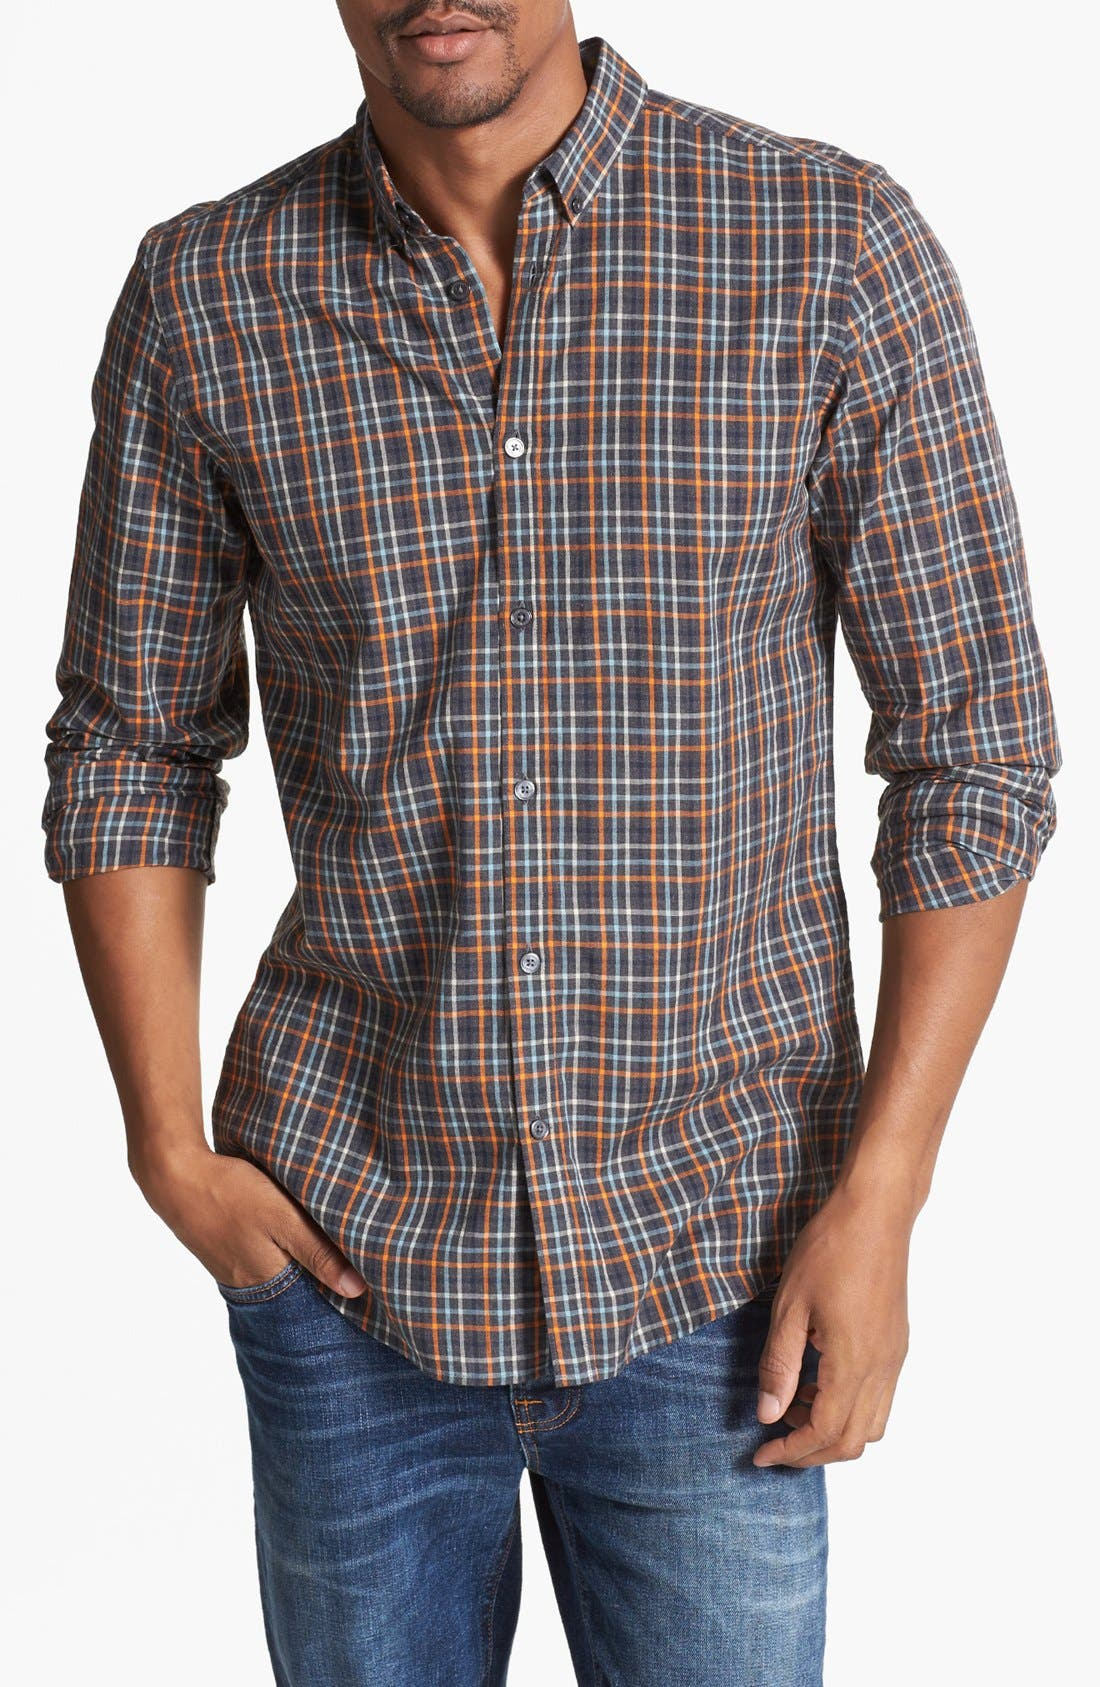 Main Image - Ben Sherman Slim Fit Plaid Shirt